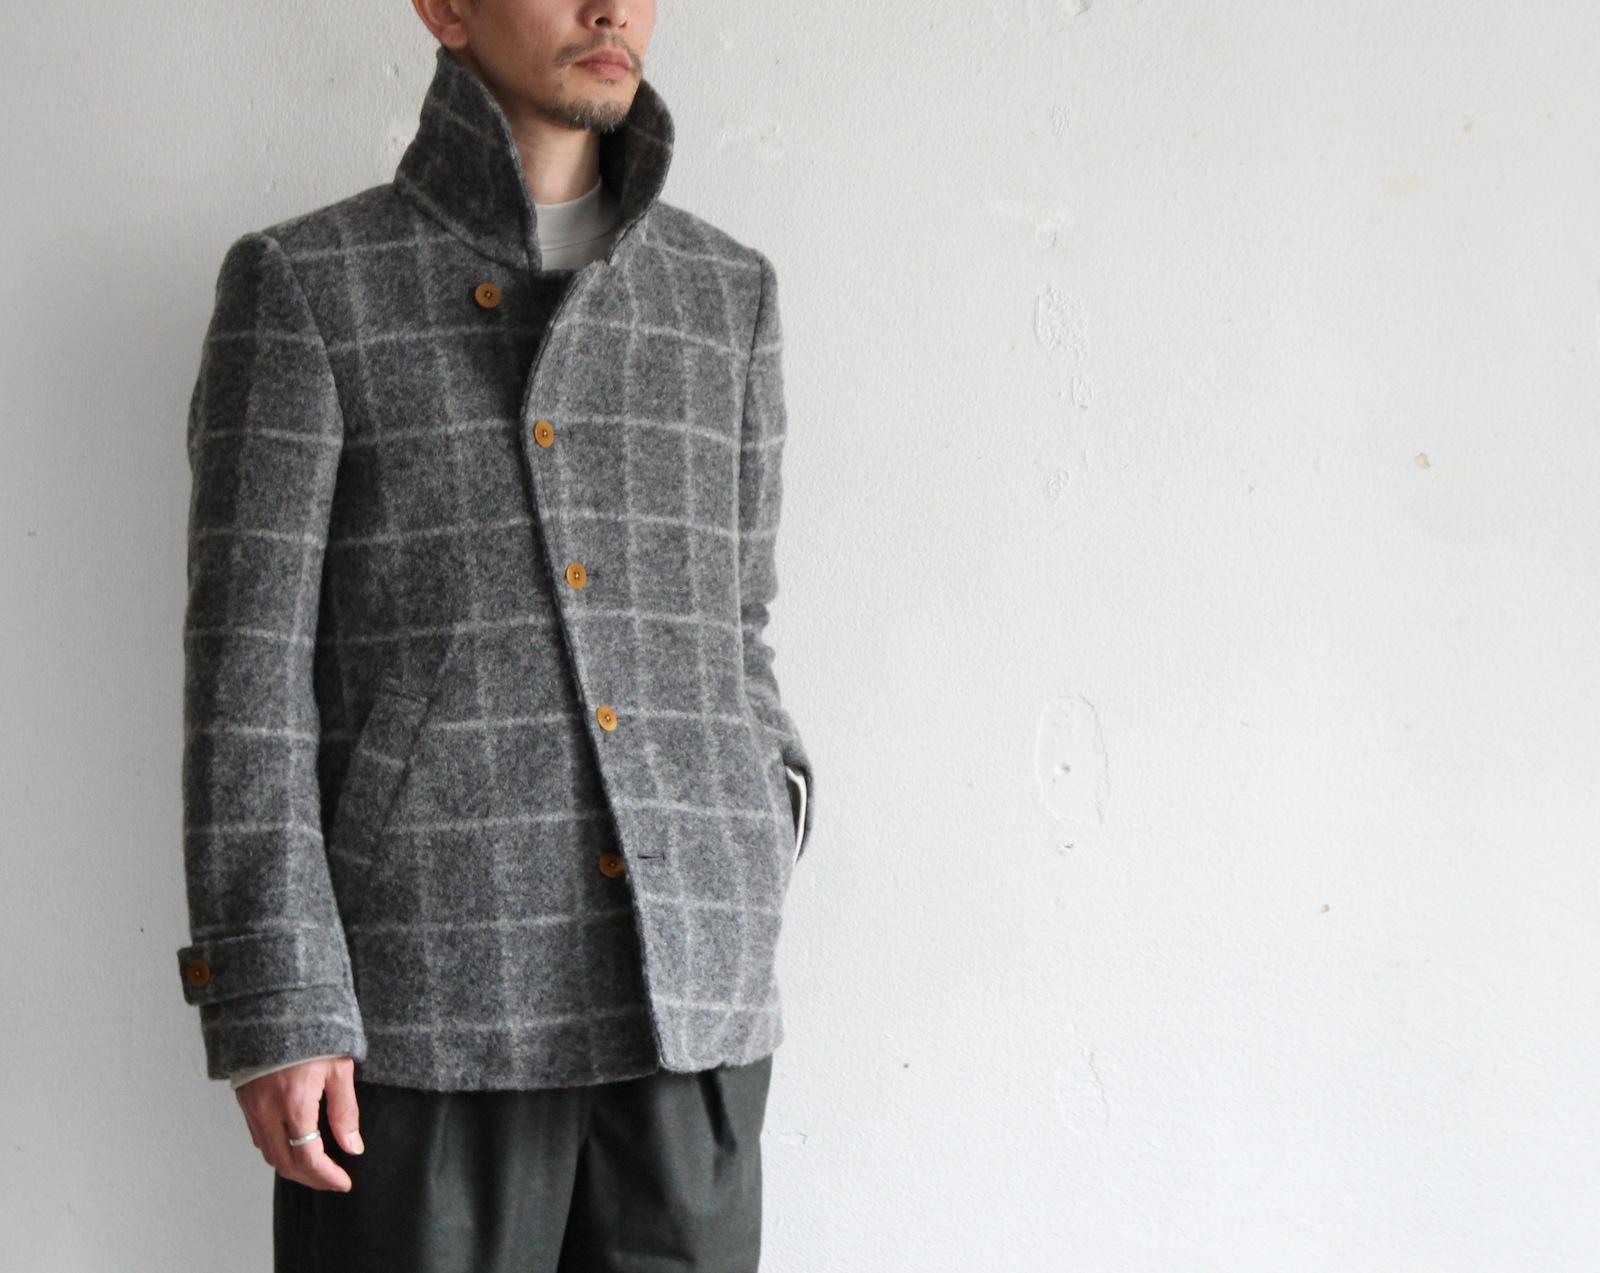 Milling Wool Knit P-coat_c0379477_18124249.jpg